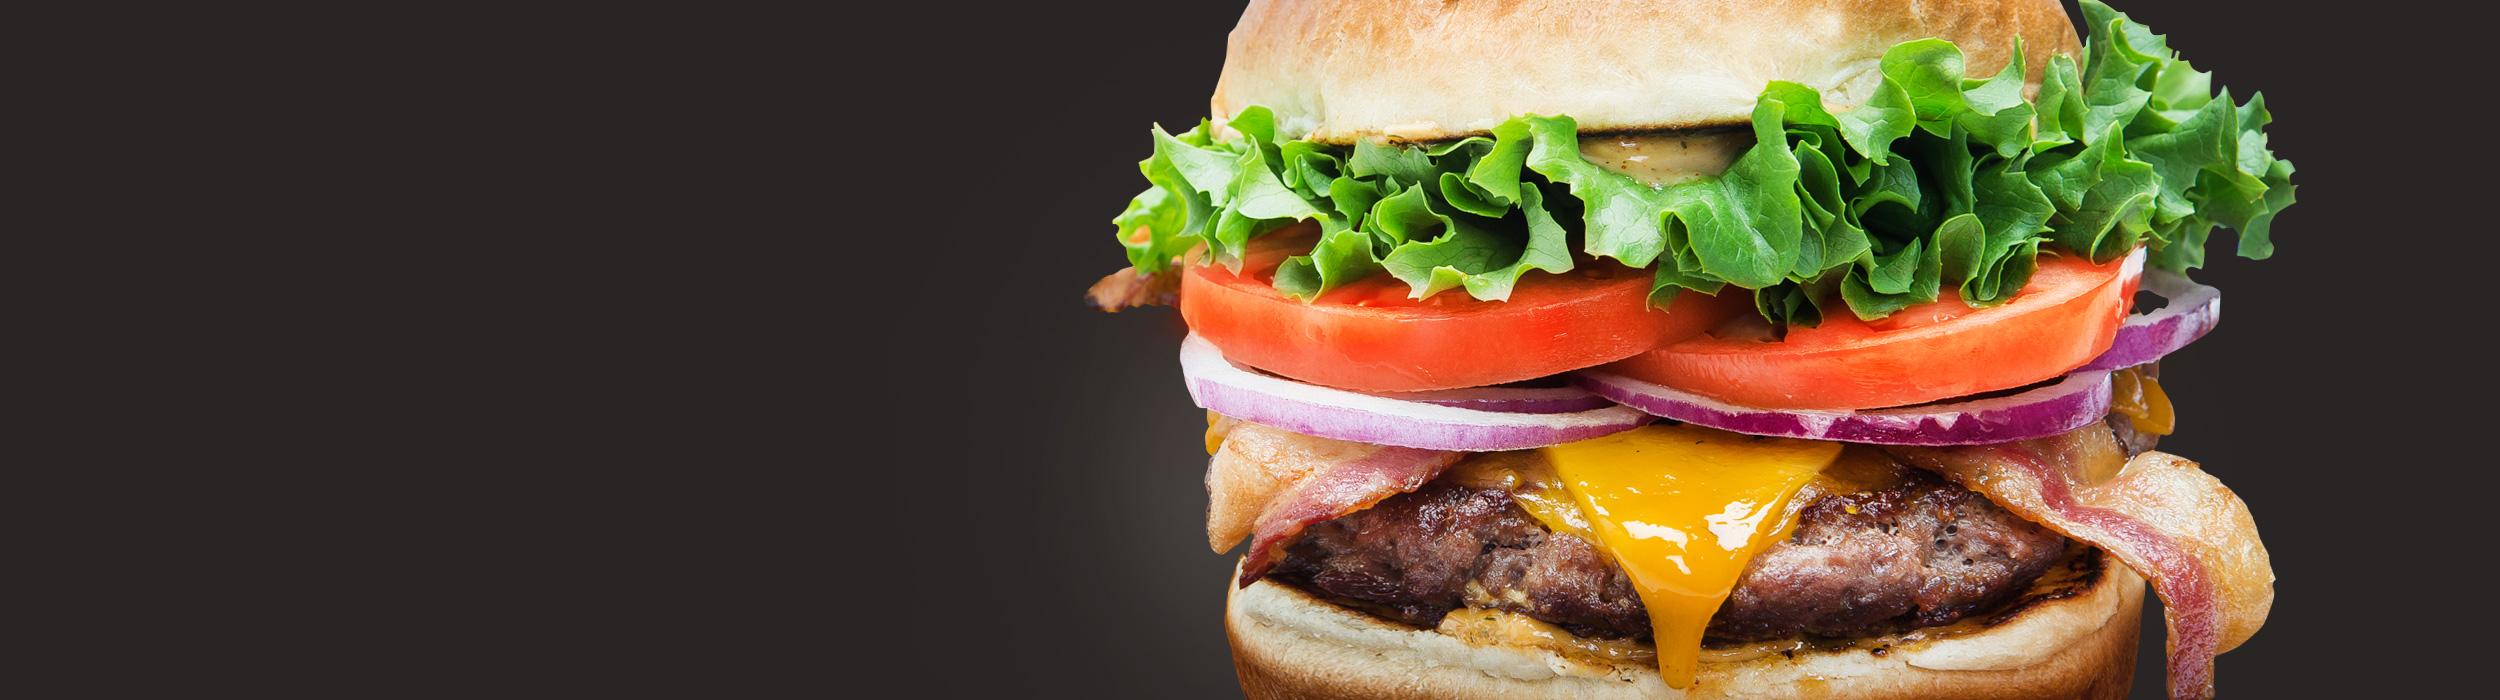 burgers-background